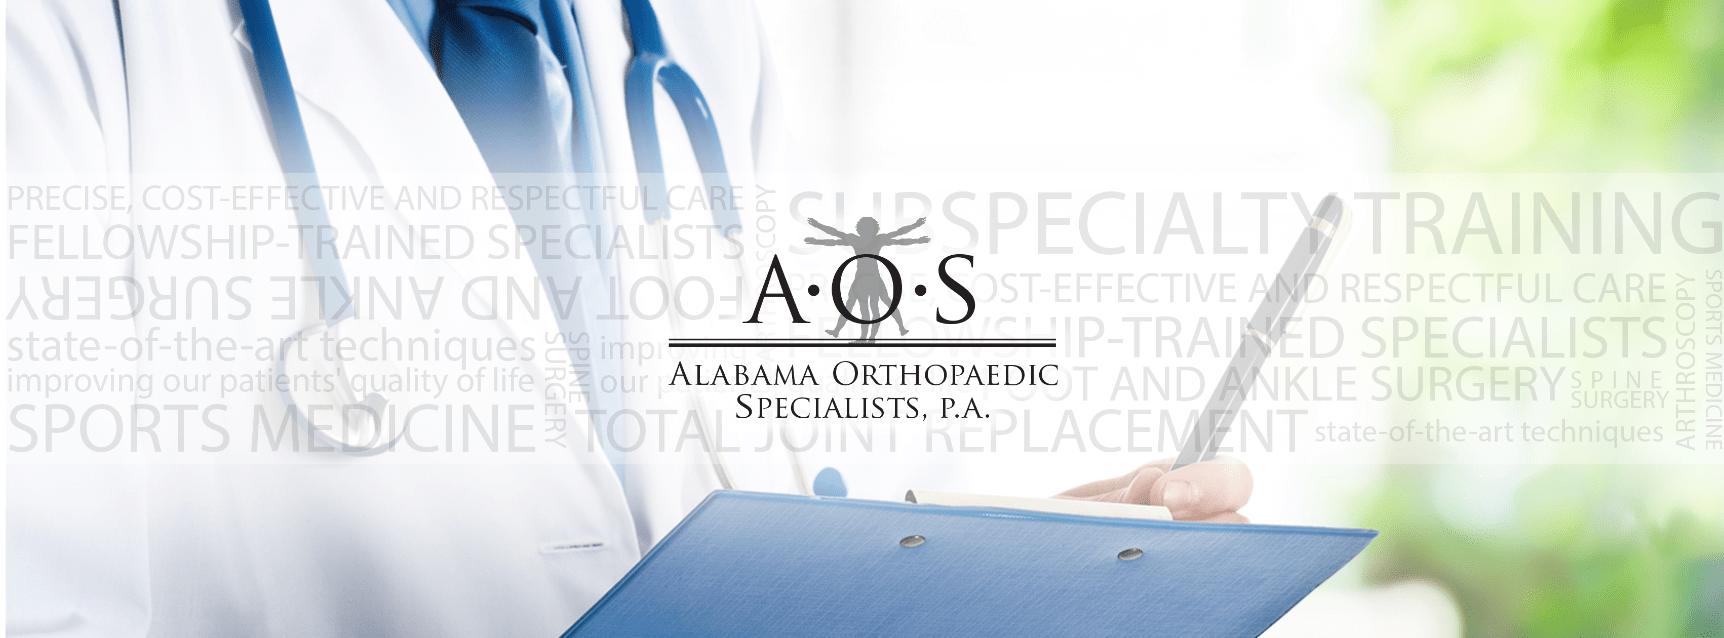 Alabama Orthopaedic Specialists social media header